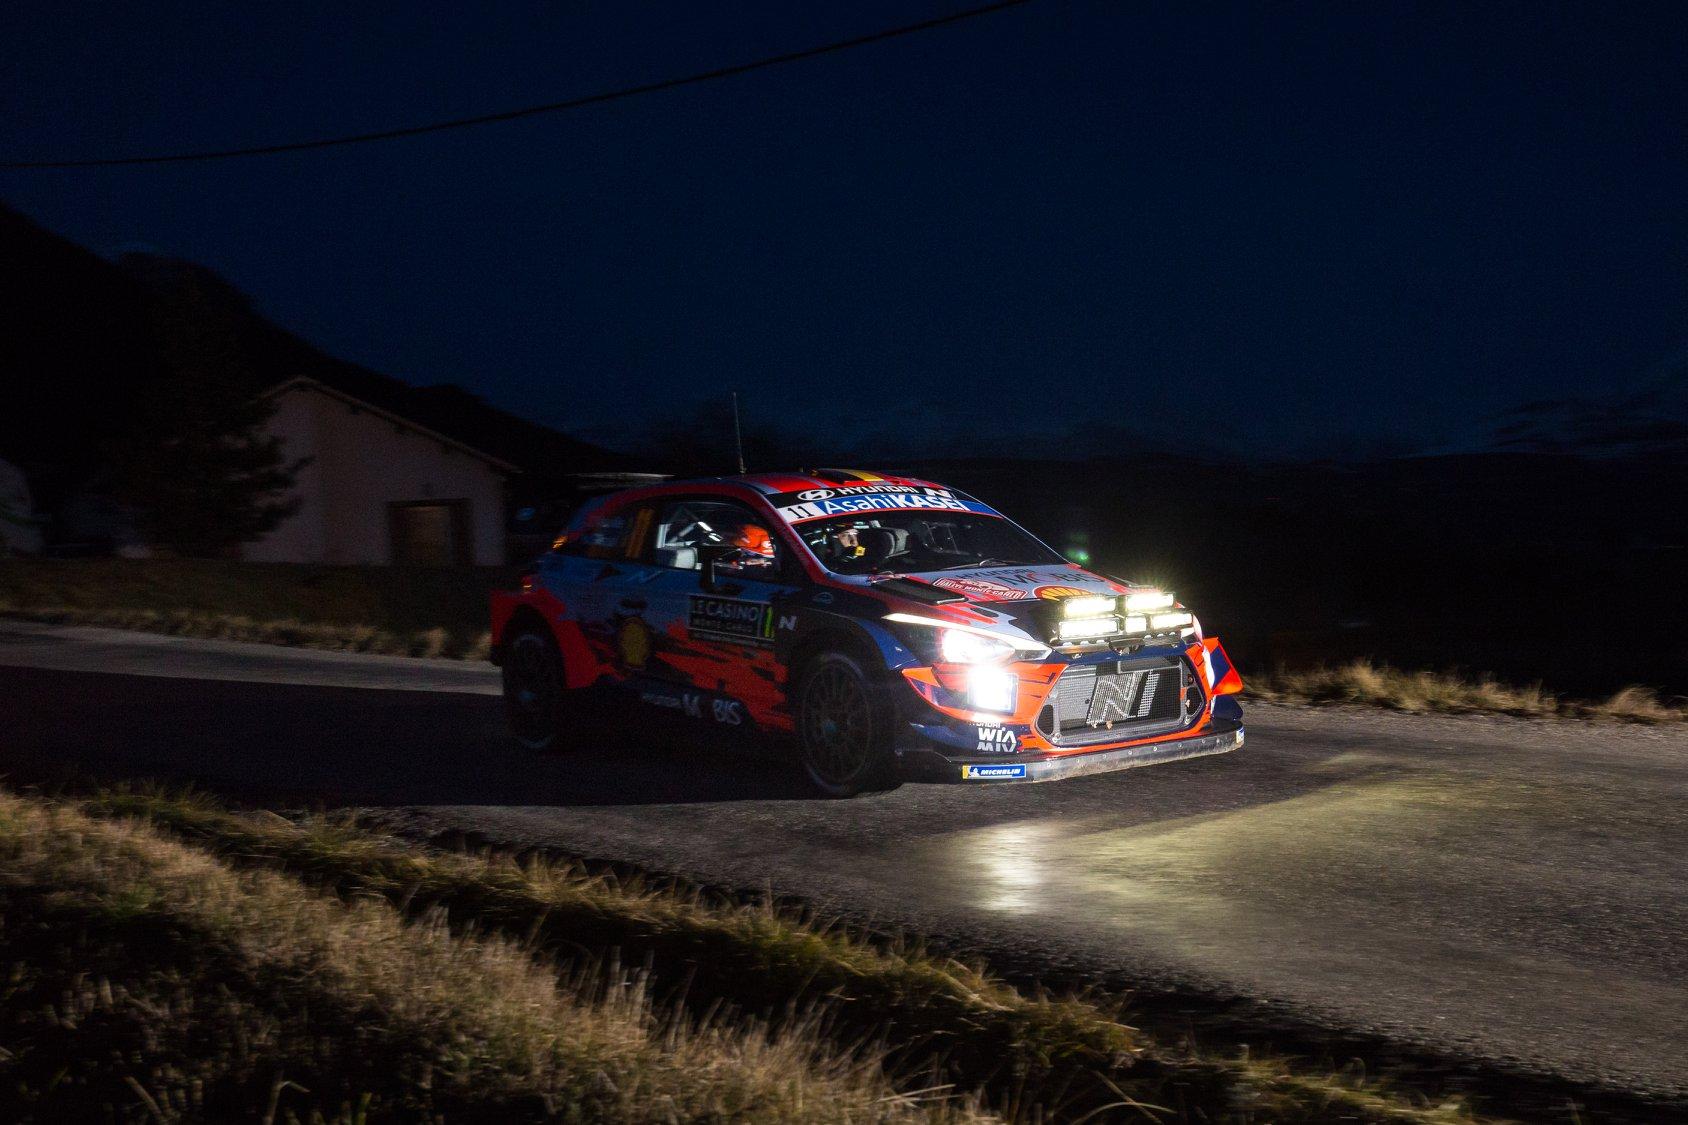 WRC: 88º Rallye Automobile de Monte-Carlo [20-26 de Enero] - Página 6 EO_9njDXUAcXiQH?format=jpg&name=large